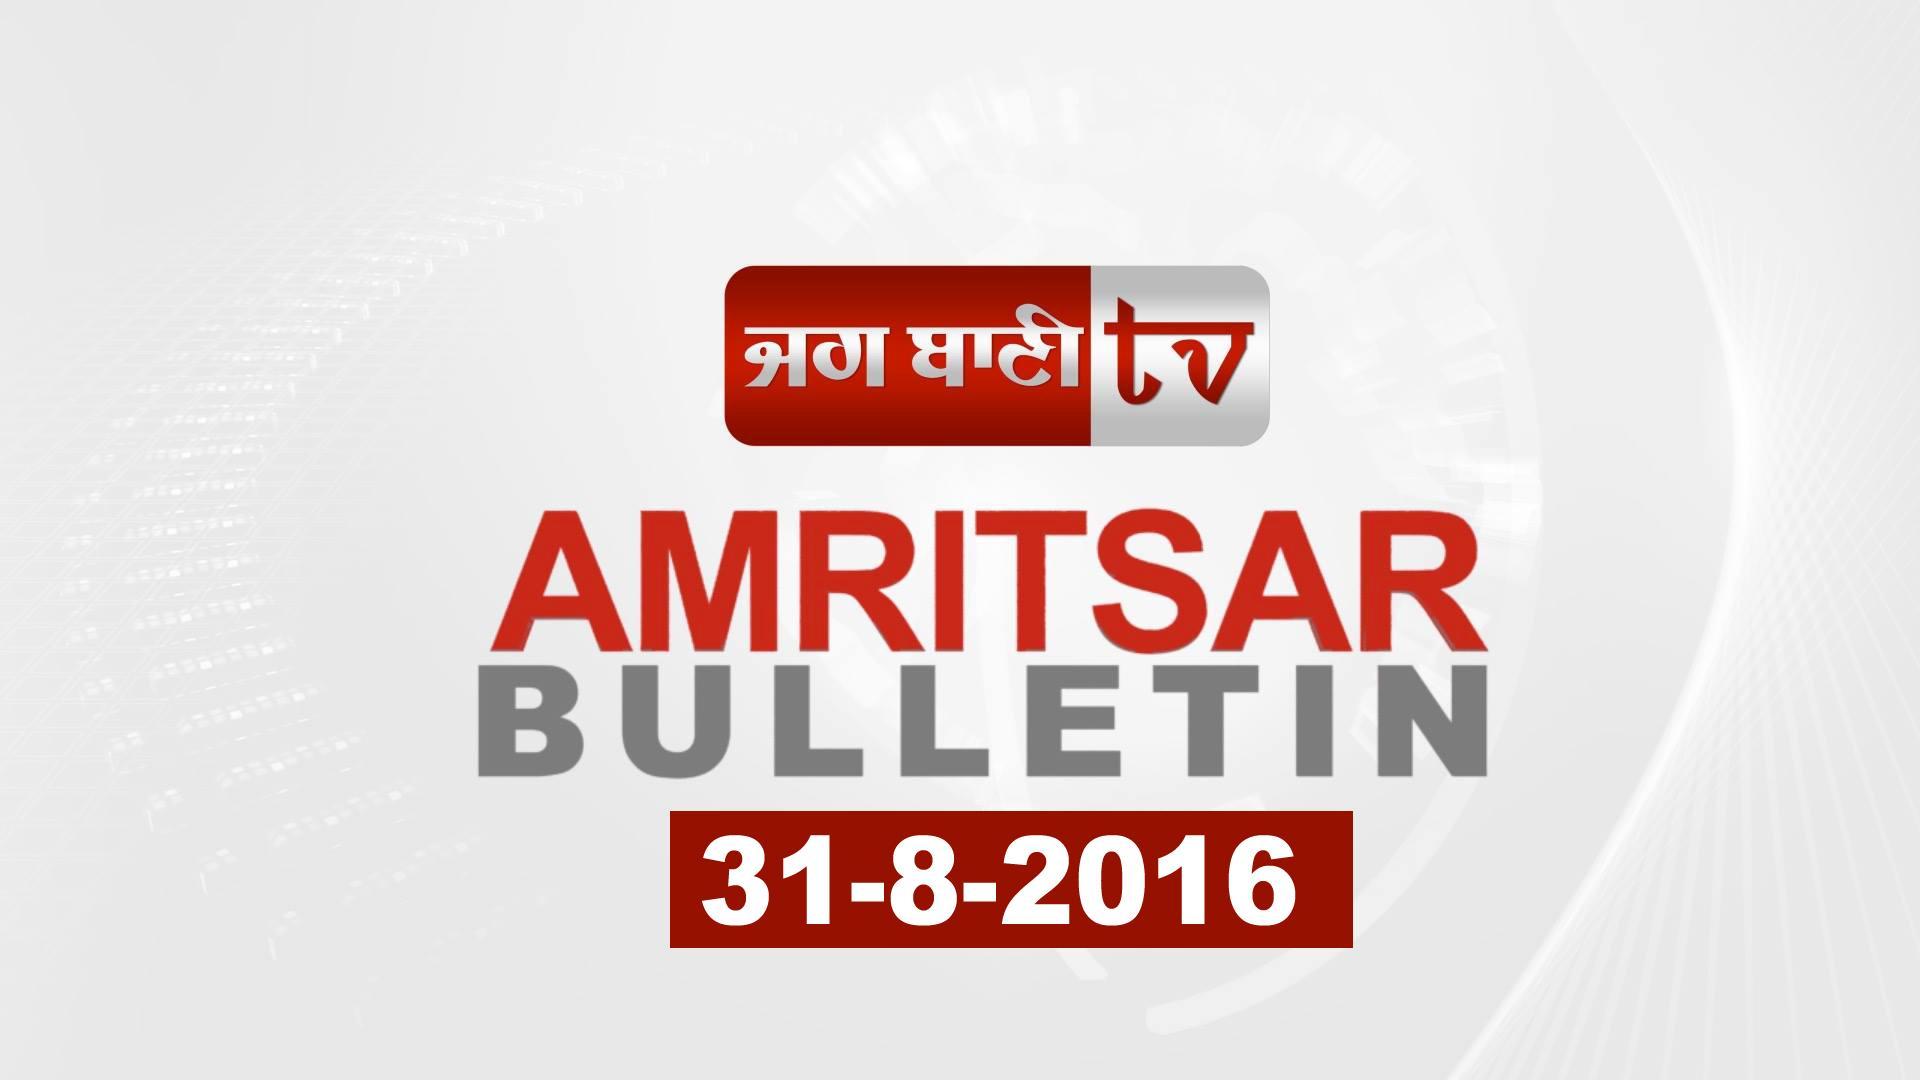 Image of Amritsar Bulletin 31st Aug : 'ਆਪ' ਨੂੰ ਪੰਜਾਬ 'ਚ ਲੱਗਿਆ ਇੱਕ ਹੋਰ ਵੱਡਾ ਝਟਕਾ